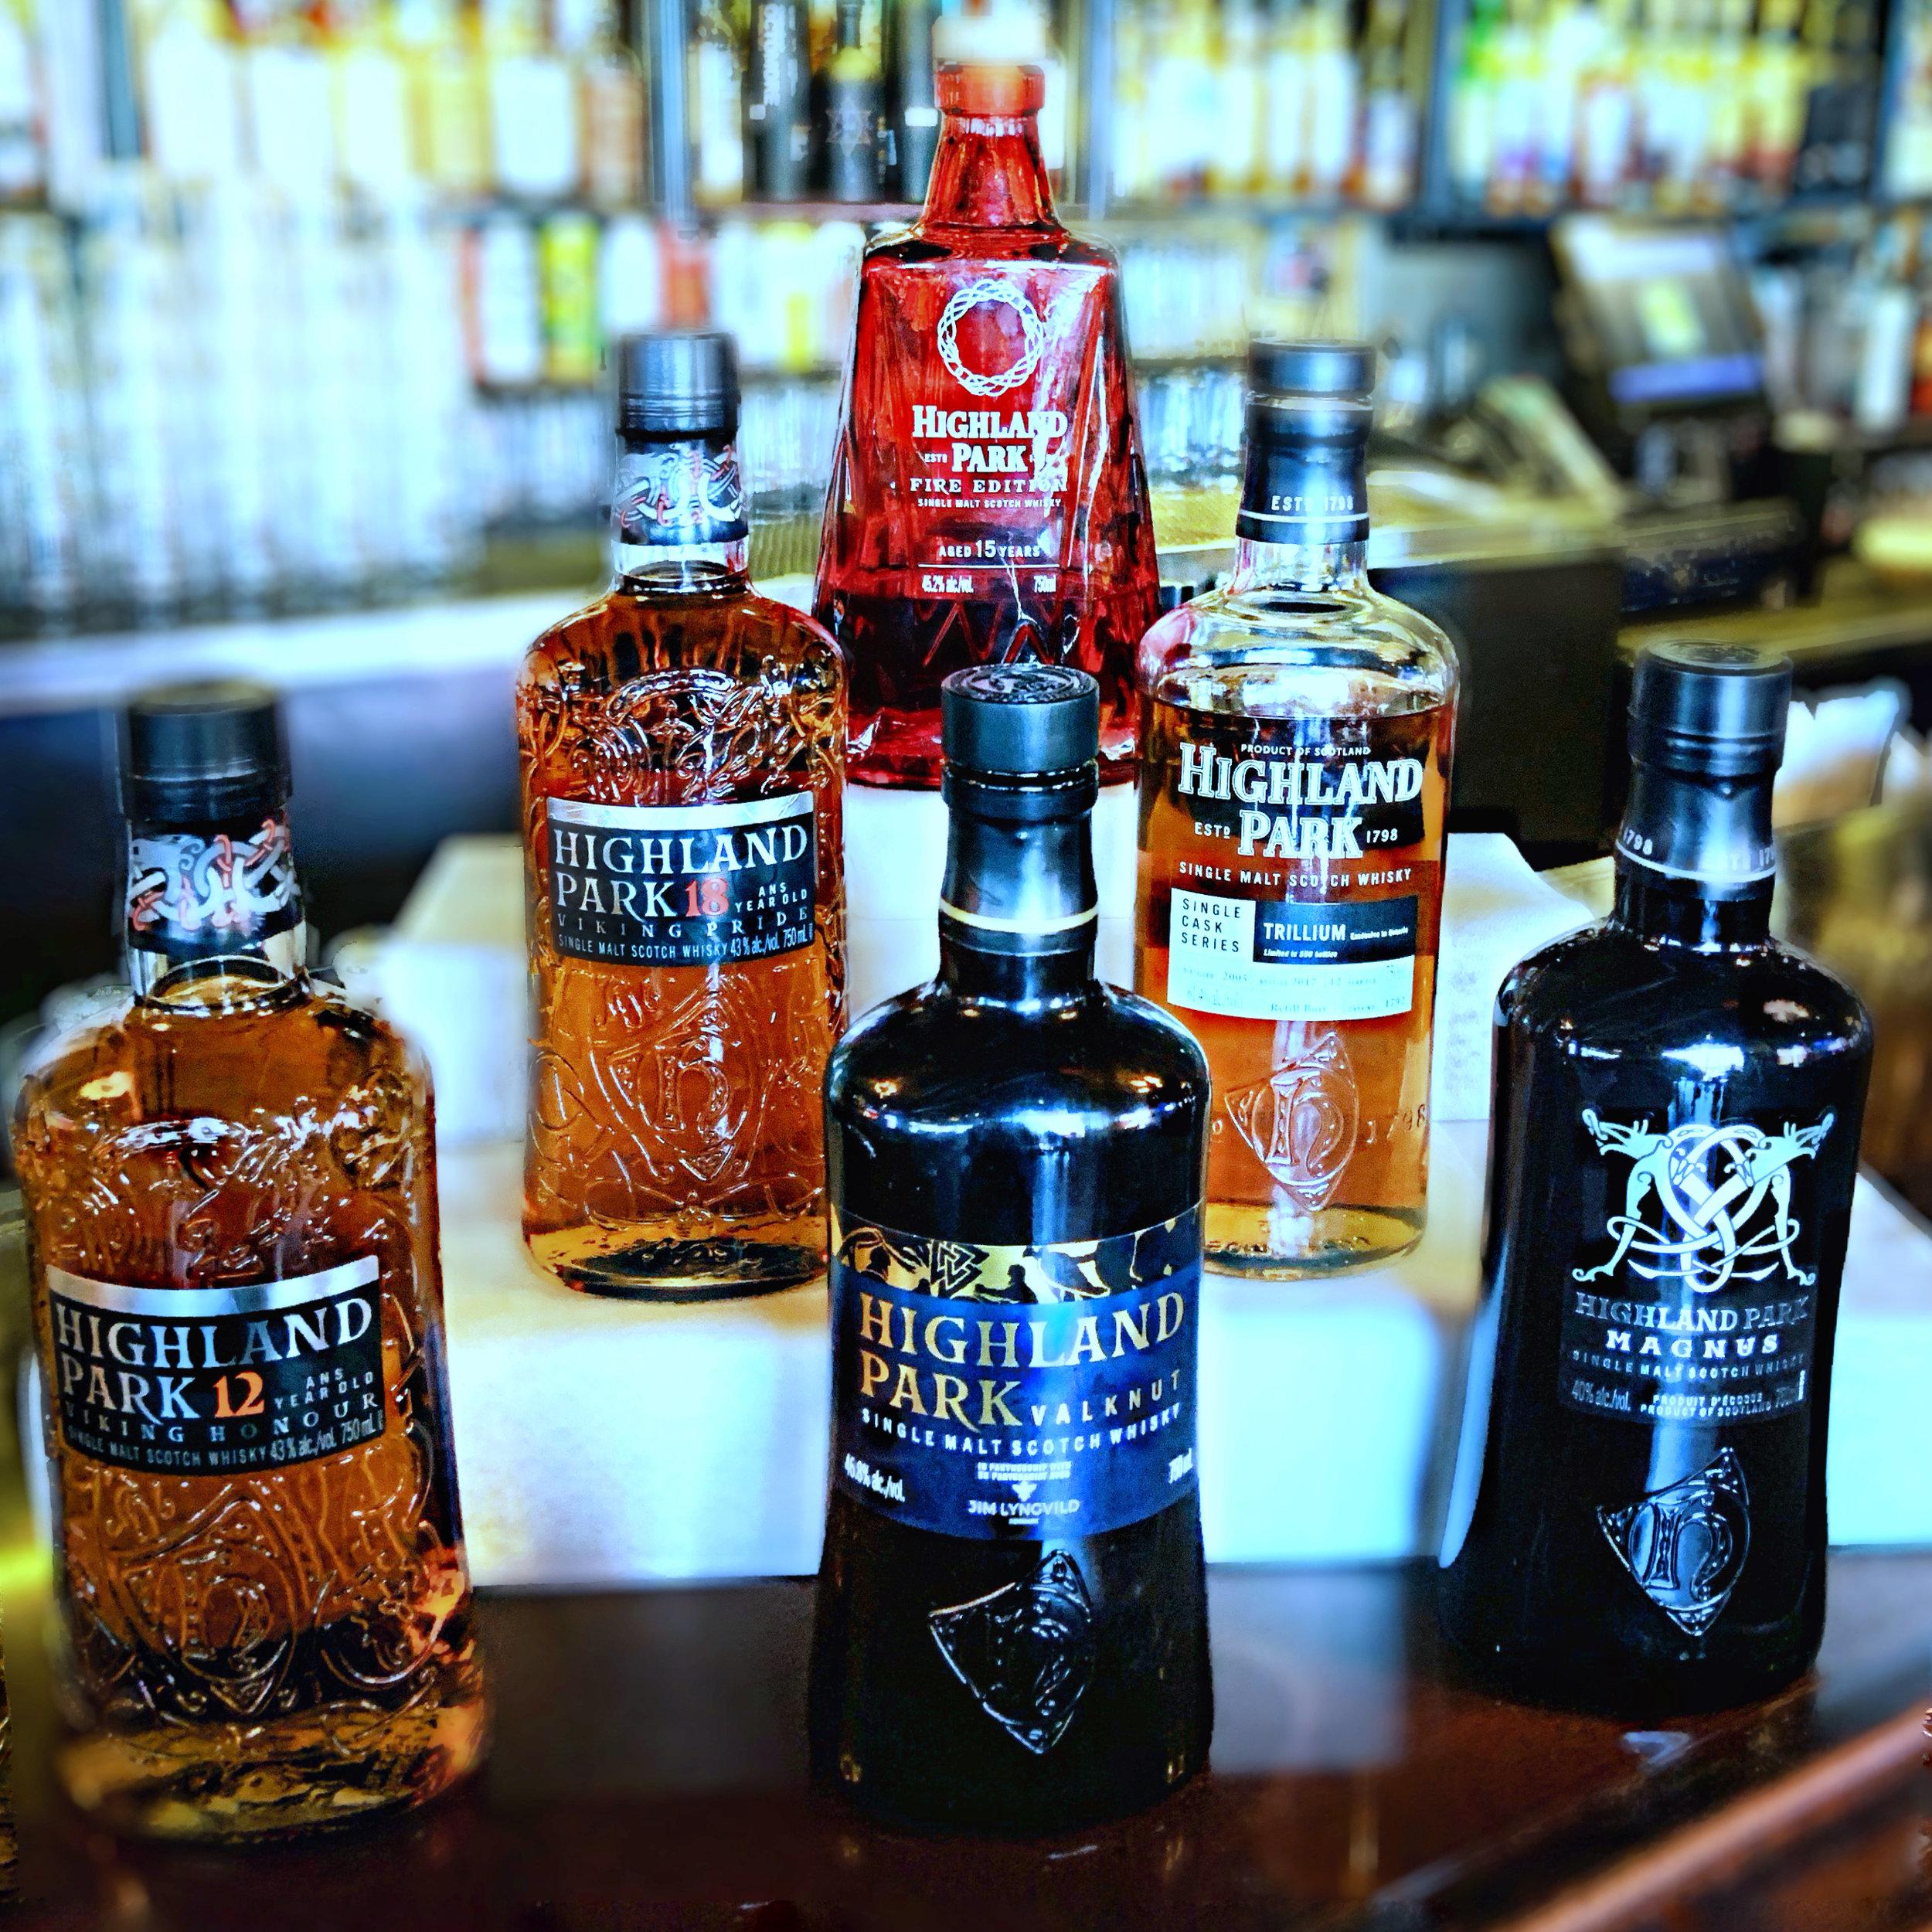 highland-park-ottawa-whisky-tasting-2019